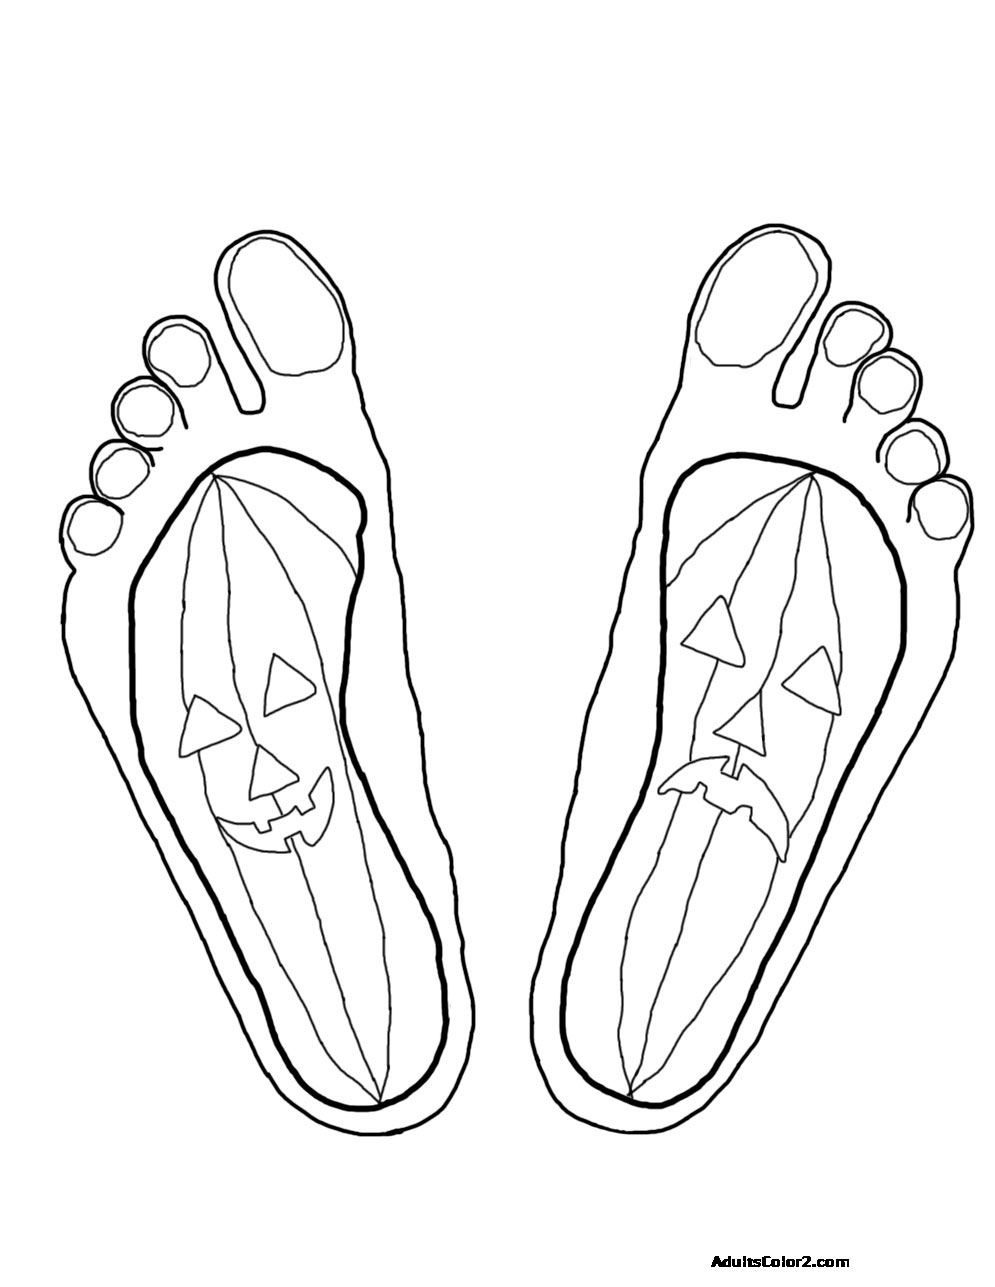 Jack o' Lantern feet.